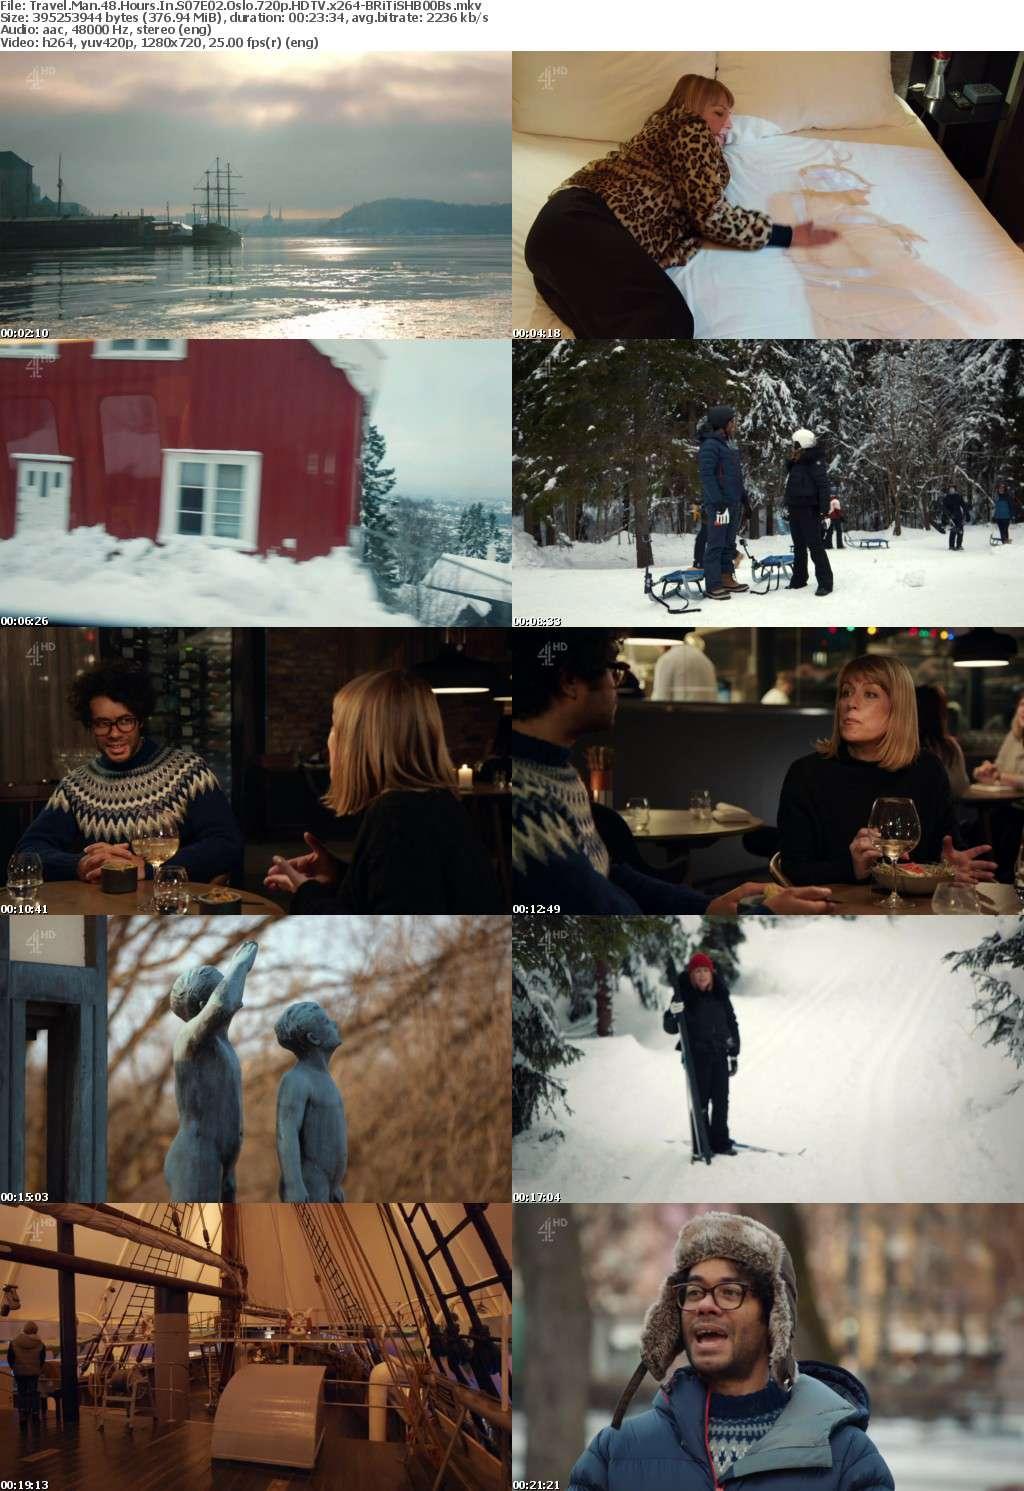 Travel Man 48 Hours In S07E02 Oslo 720p HDTV x264-BRiTiSHB00Bs